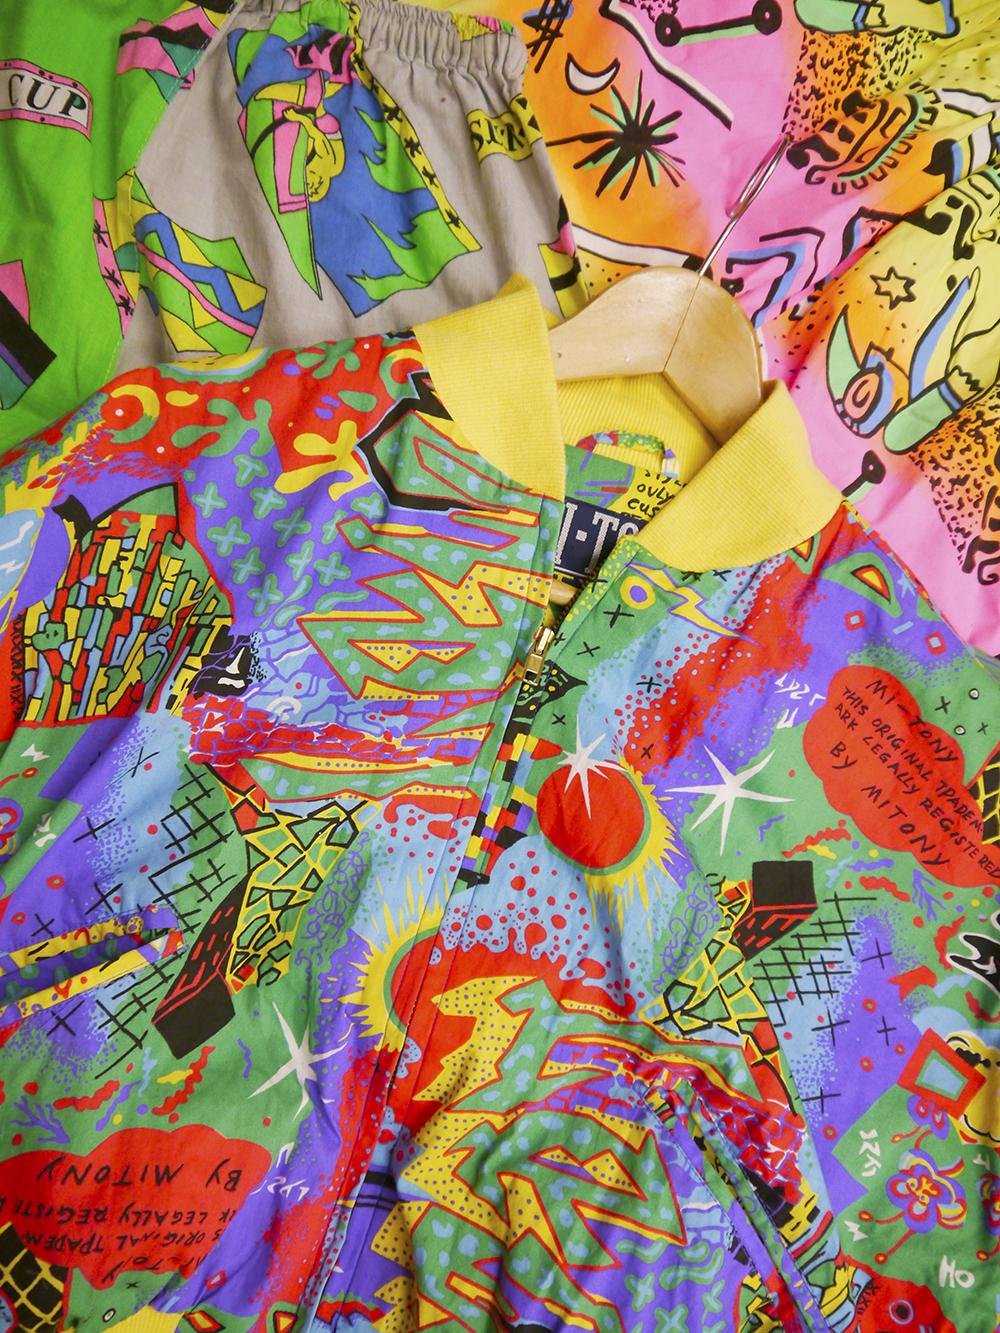 studio visit, designer studio, local designer, Scottish designer, Dundee designer, Dreamland, Dreamland Clothing label, colourful design, Wasps Artists Studios, Dundee Artist studios, Kickstarter Campaign, saved by the bell inspired clothing, Kickstarter, shop local, Q&A, designer interview, behind the scenes